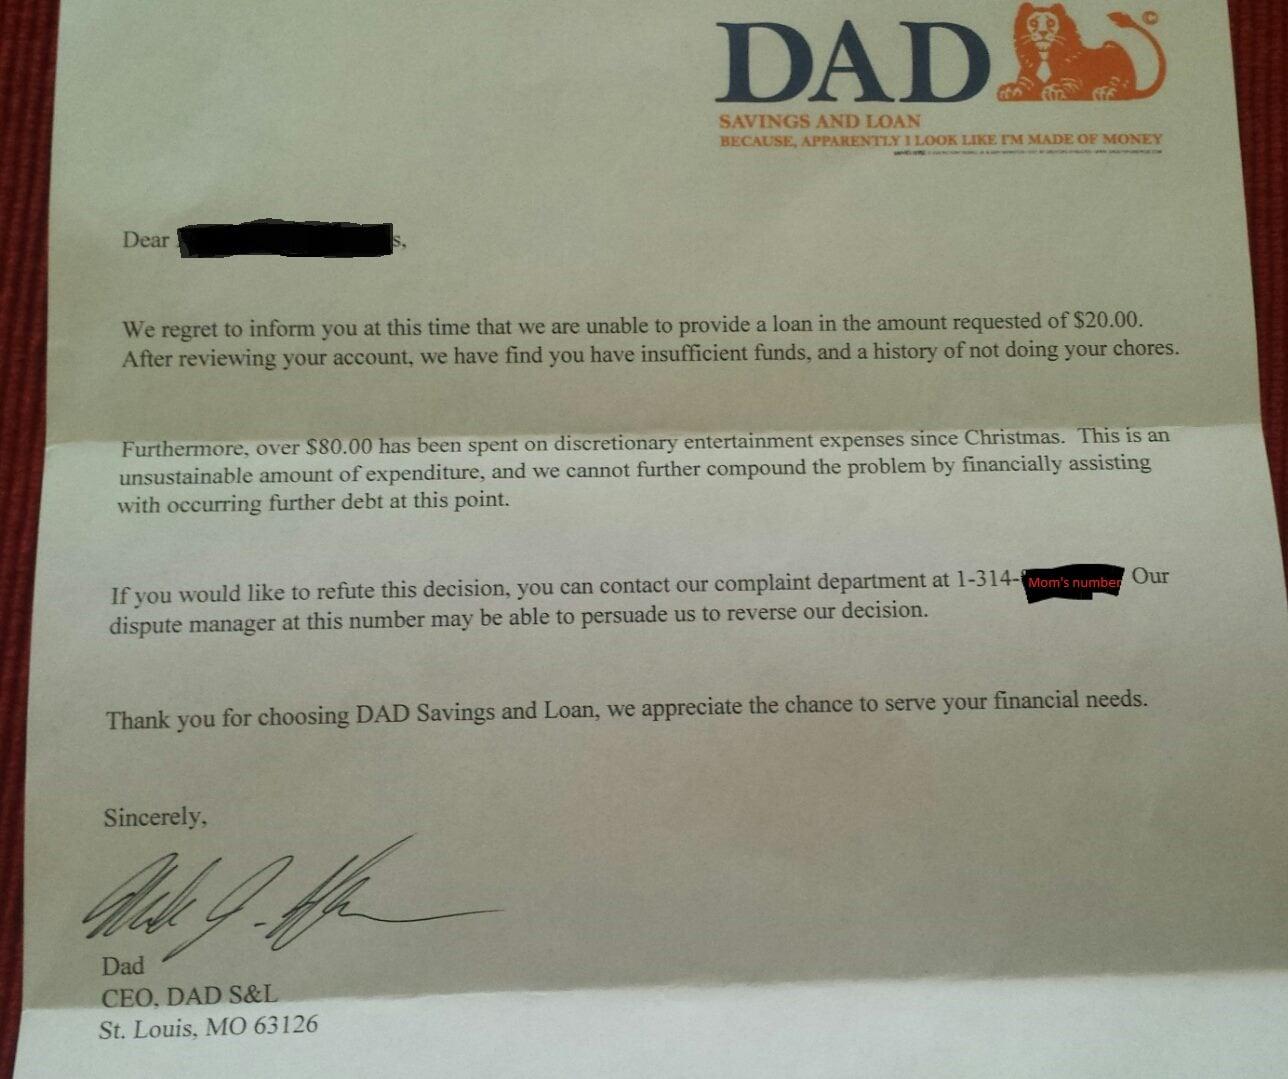 dad sends official bank letter to son who asked for money popsugar moms